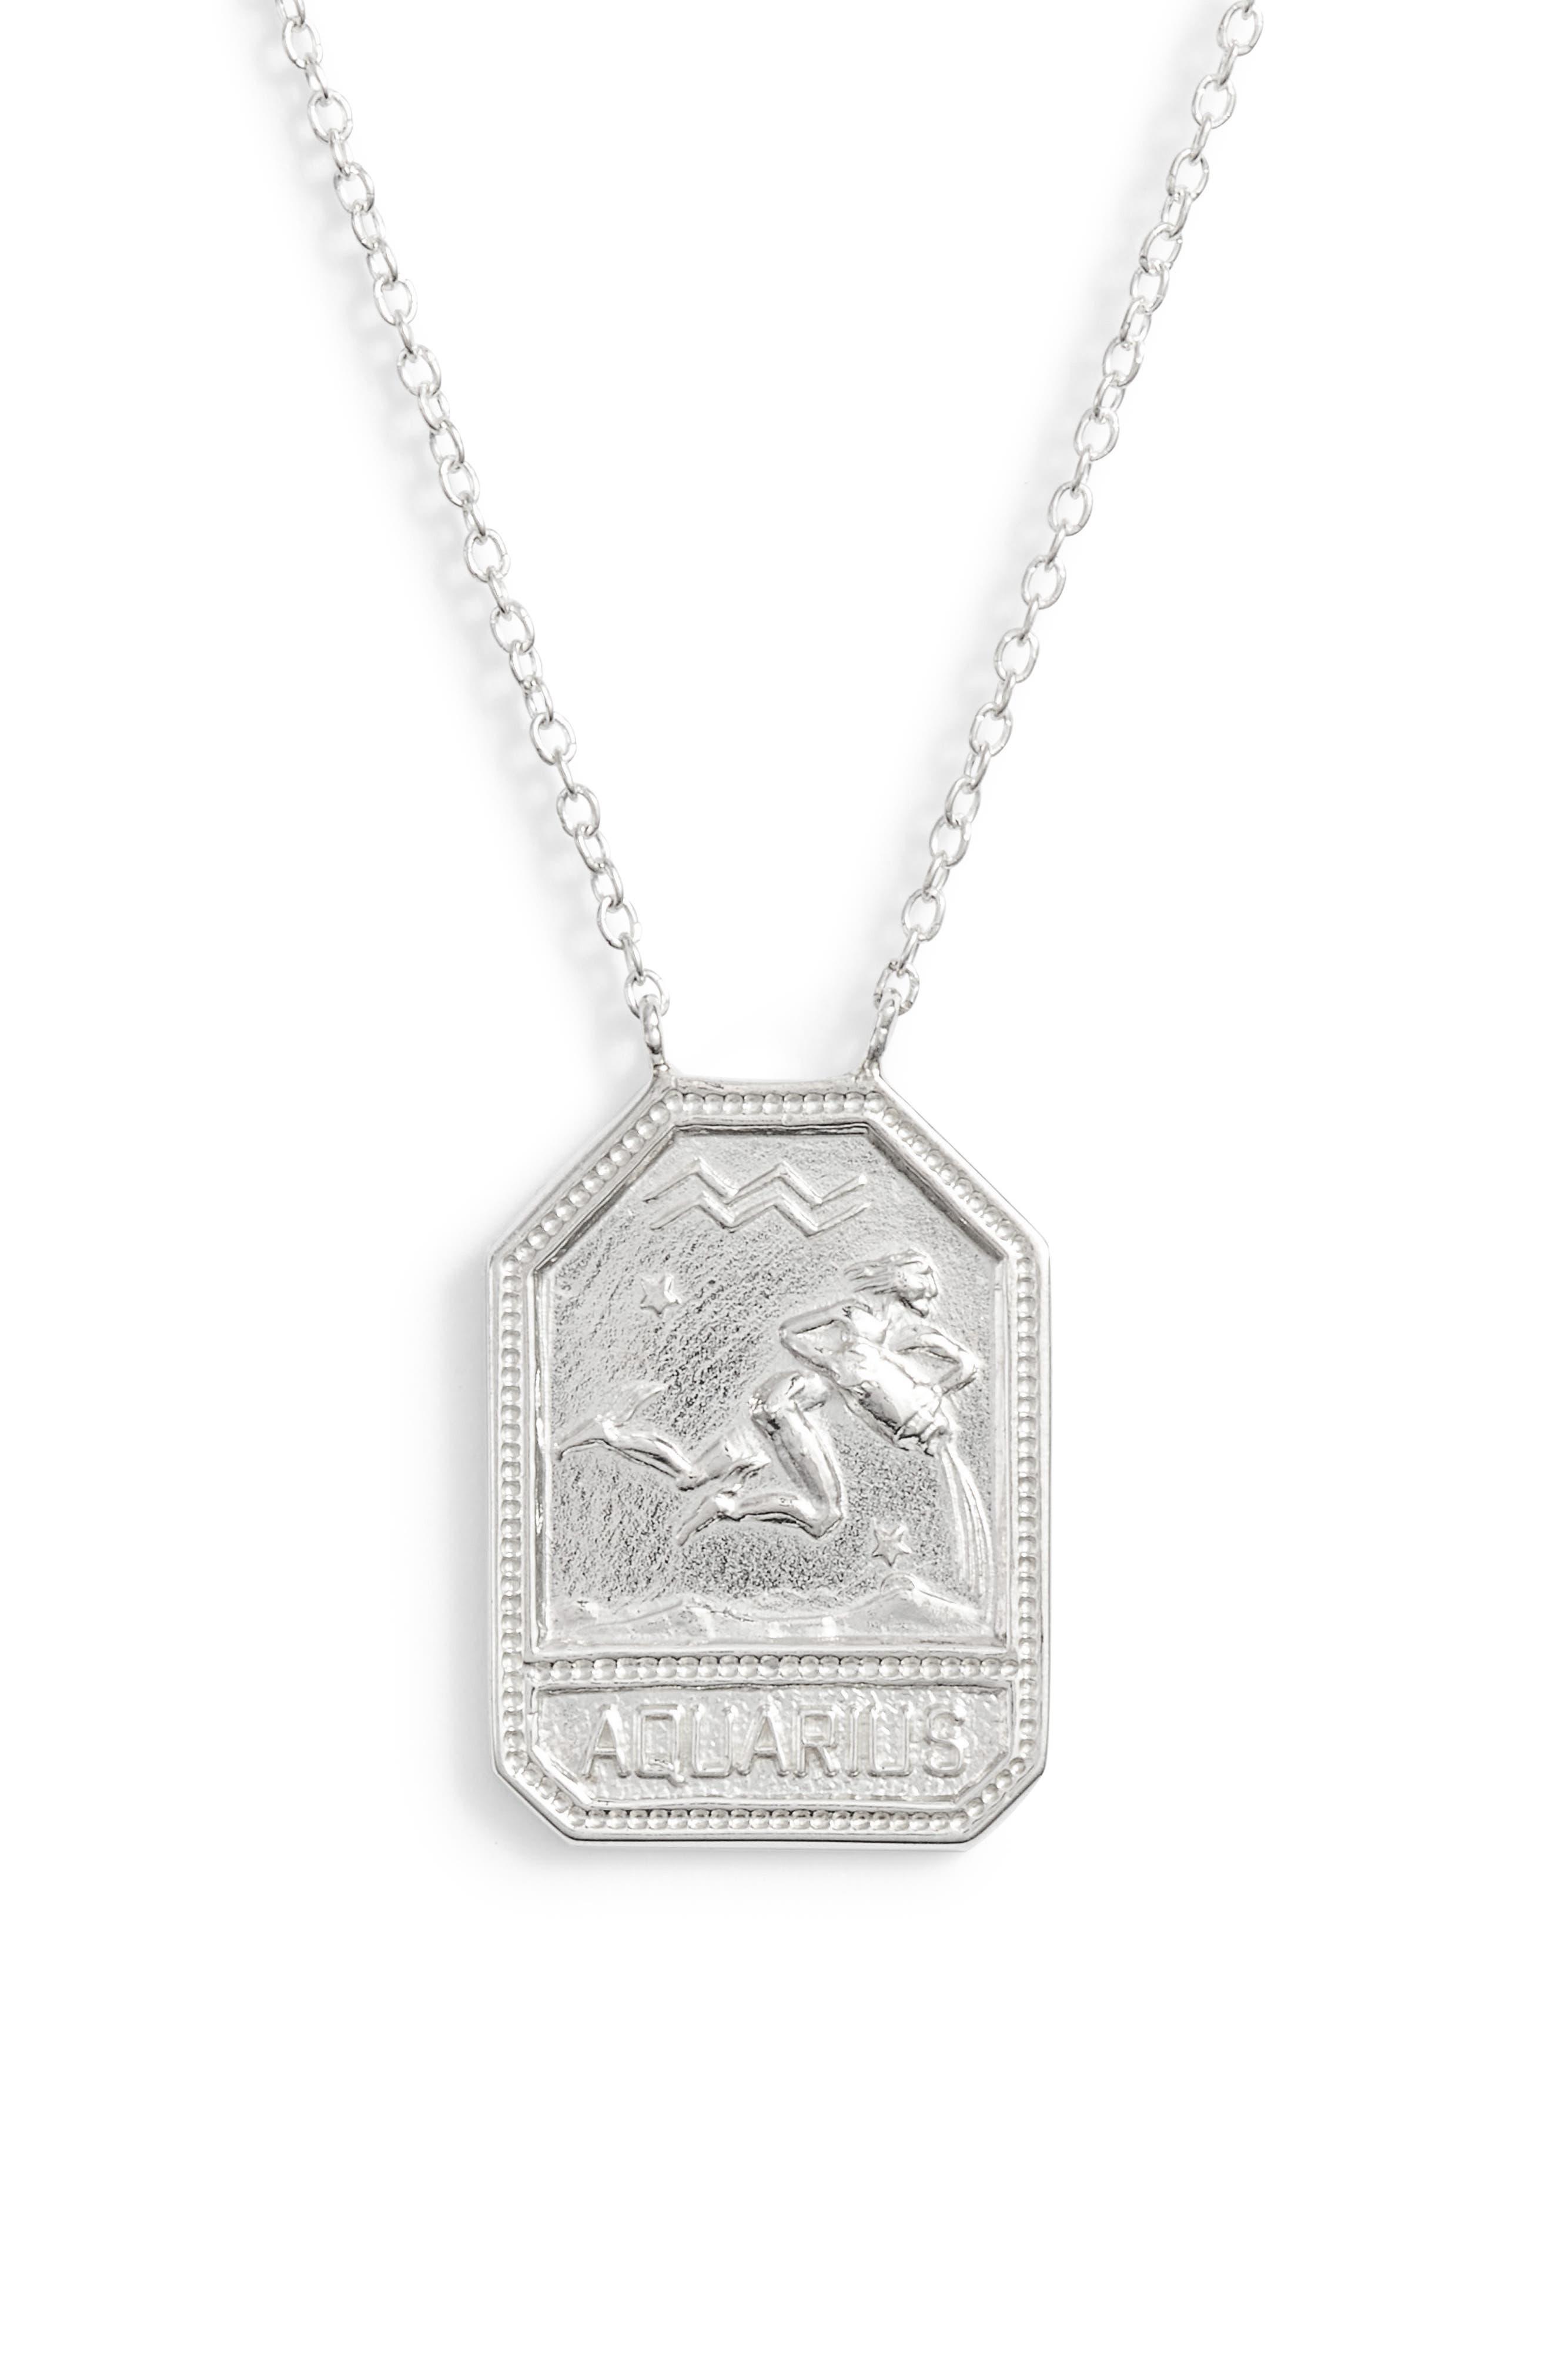 Jewelry Kiana Zodiac Pendant Necklace,                             Alternate thumbnail 2, color,                             AQUARIUS-SILVER